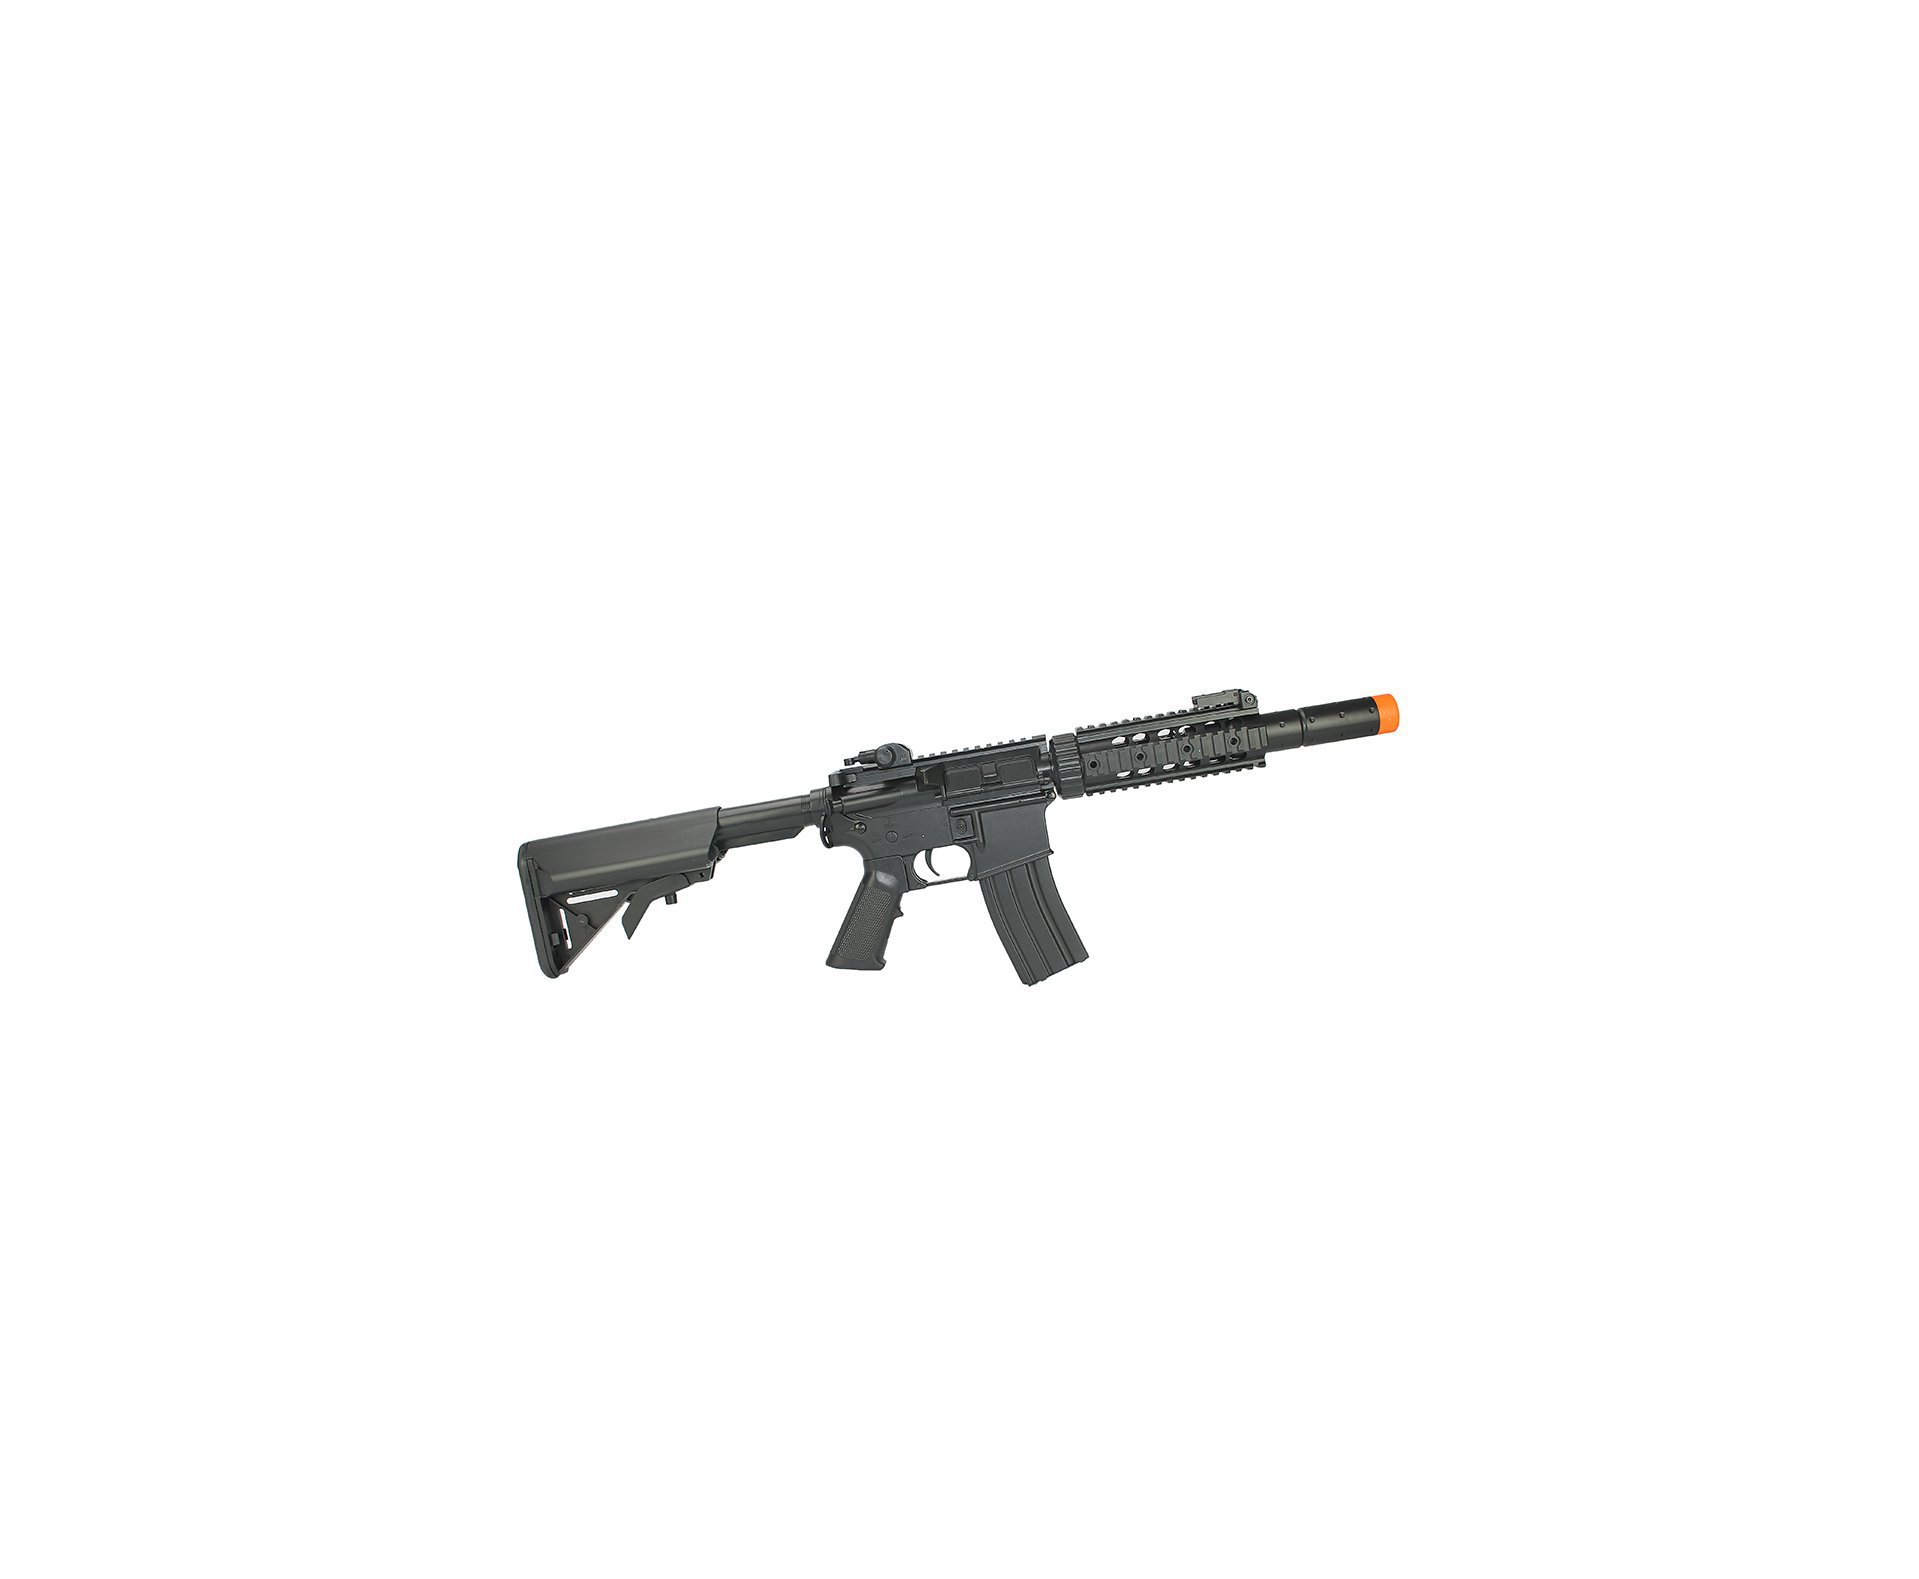 Rifle De Airsoft M4a1 Ris Black Cm513 Cal 6mm - Eletrico - Bivolt - Cyma